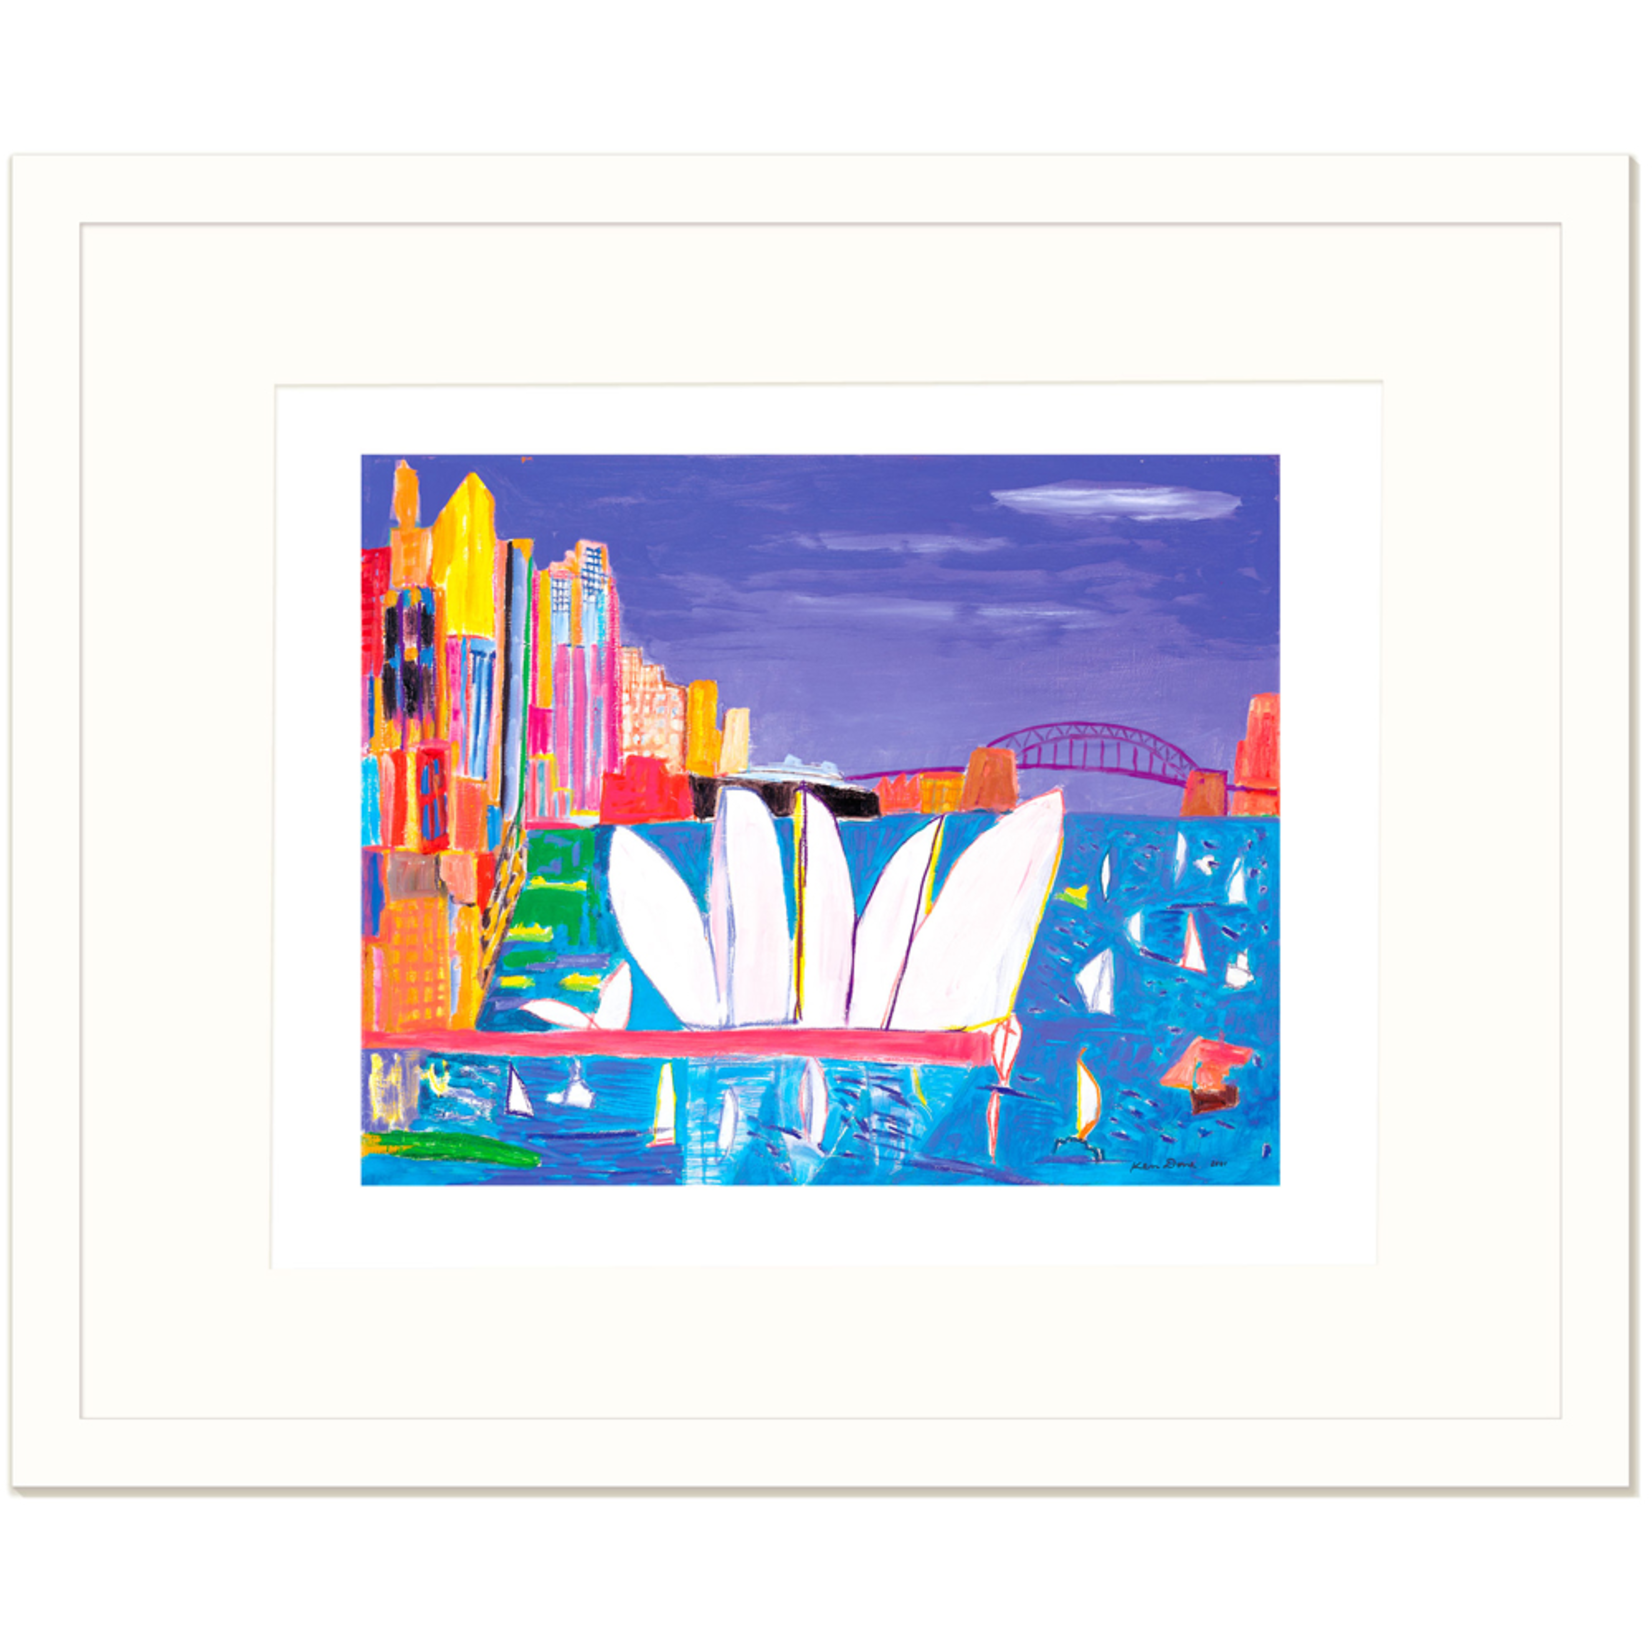 Limited Edition Prints Sydney Harbour, turquoise sea, black liner, 2006